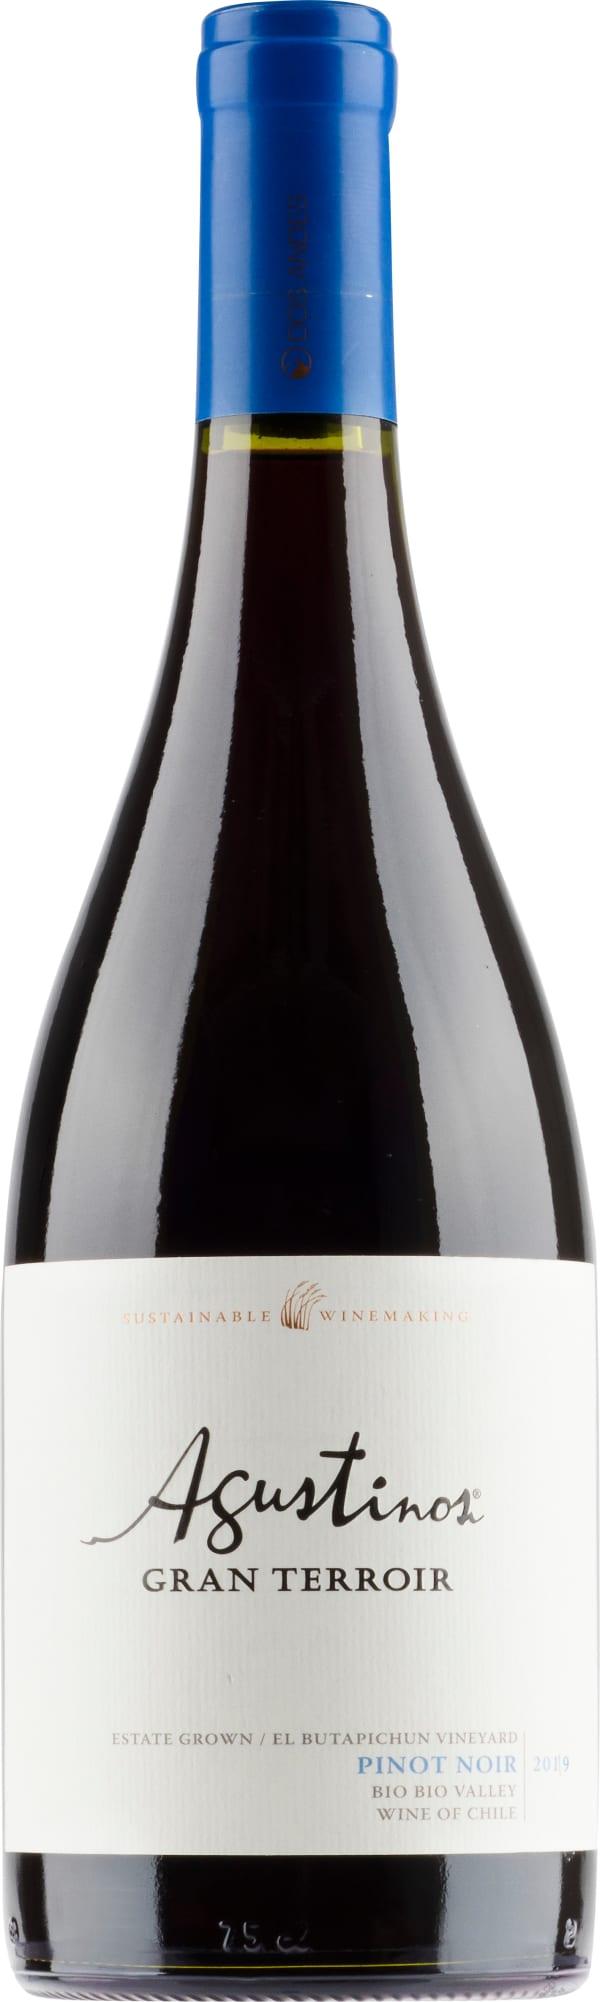 Agustinos Gran Terroir Pinot Noir 2019